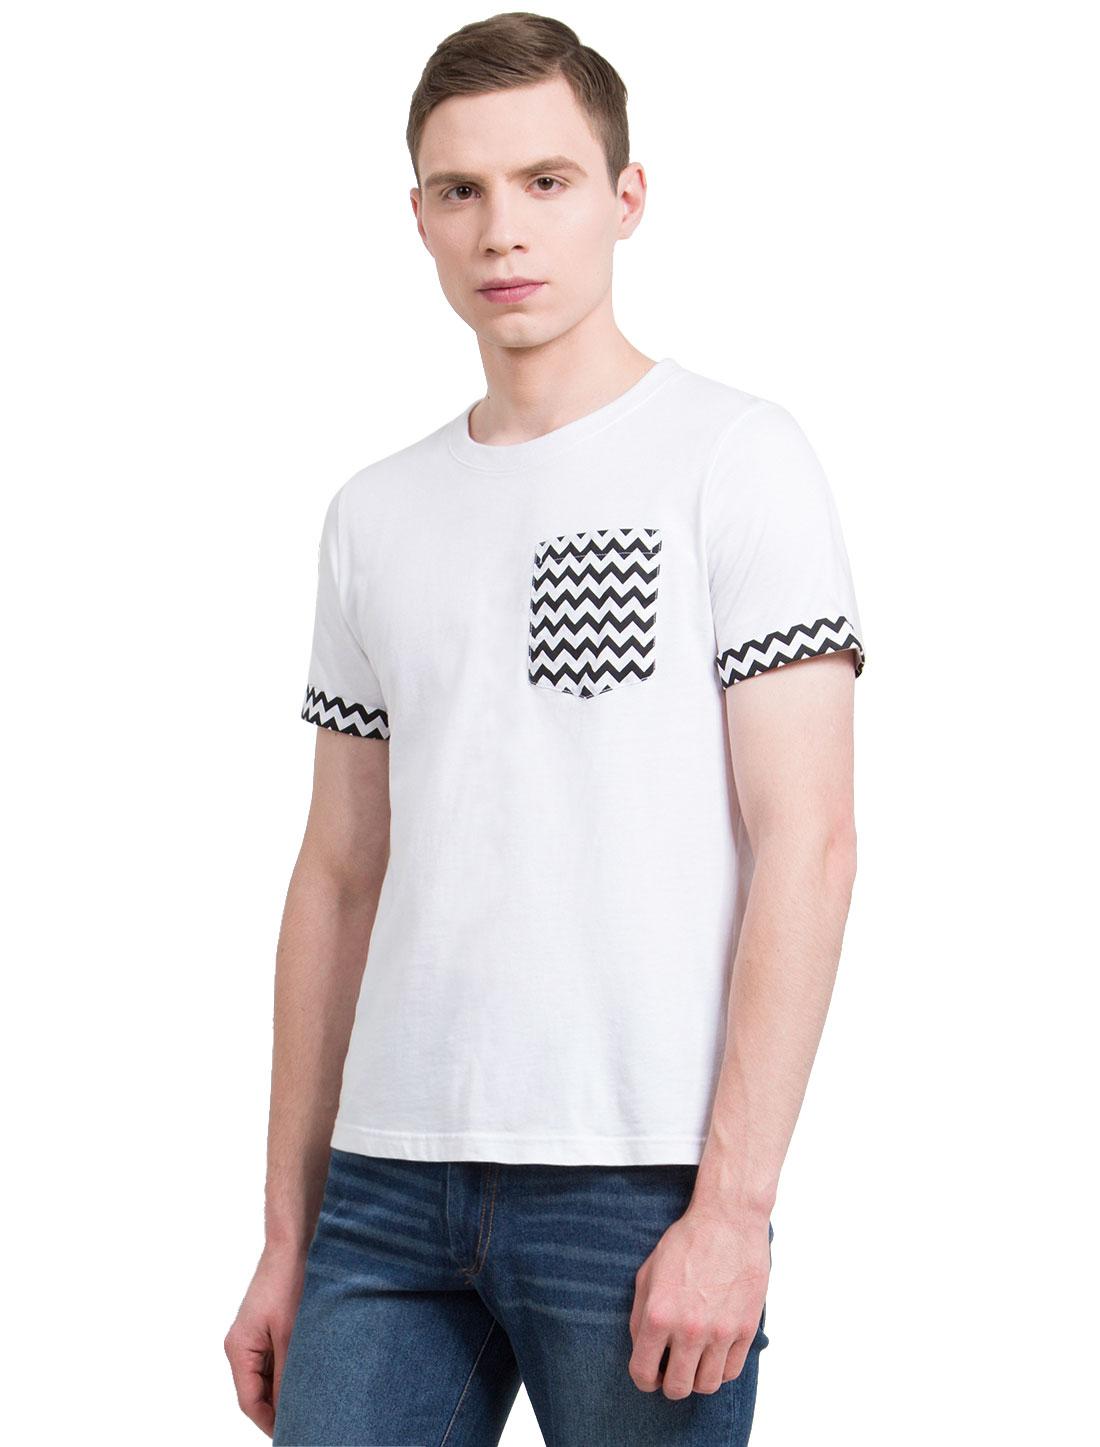 Man Crew Neck Short-Sleeved Cotton Chevron Tee Shirt White M